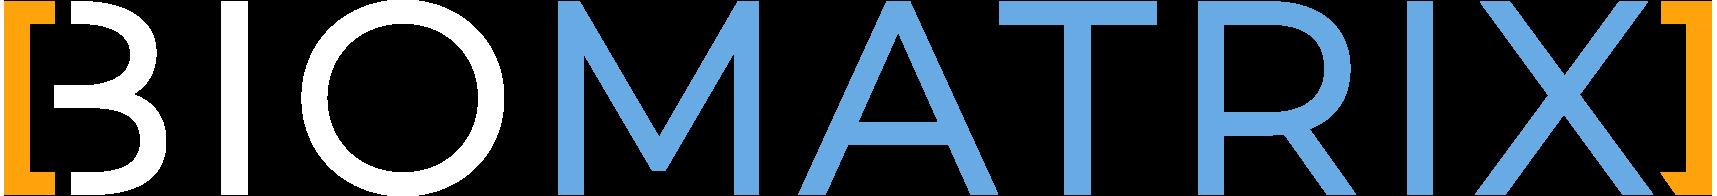 BioMatrix-2.0-logo-reversed.png